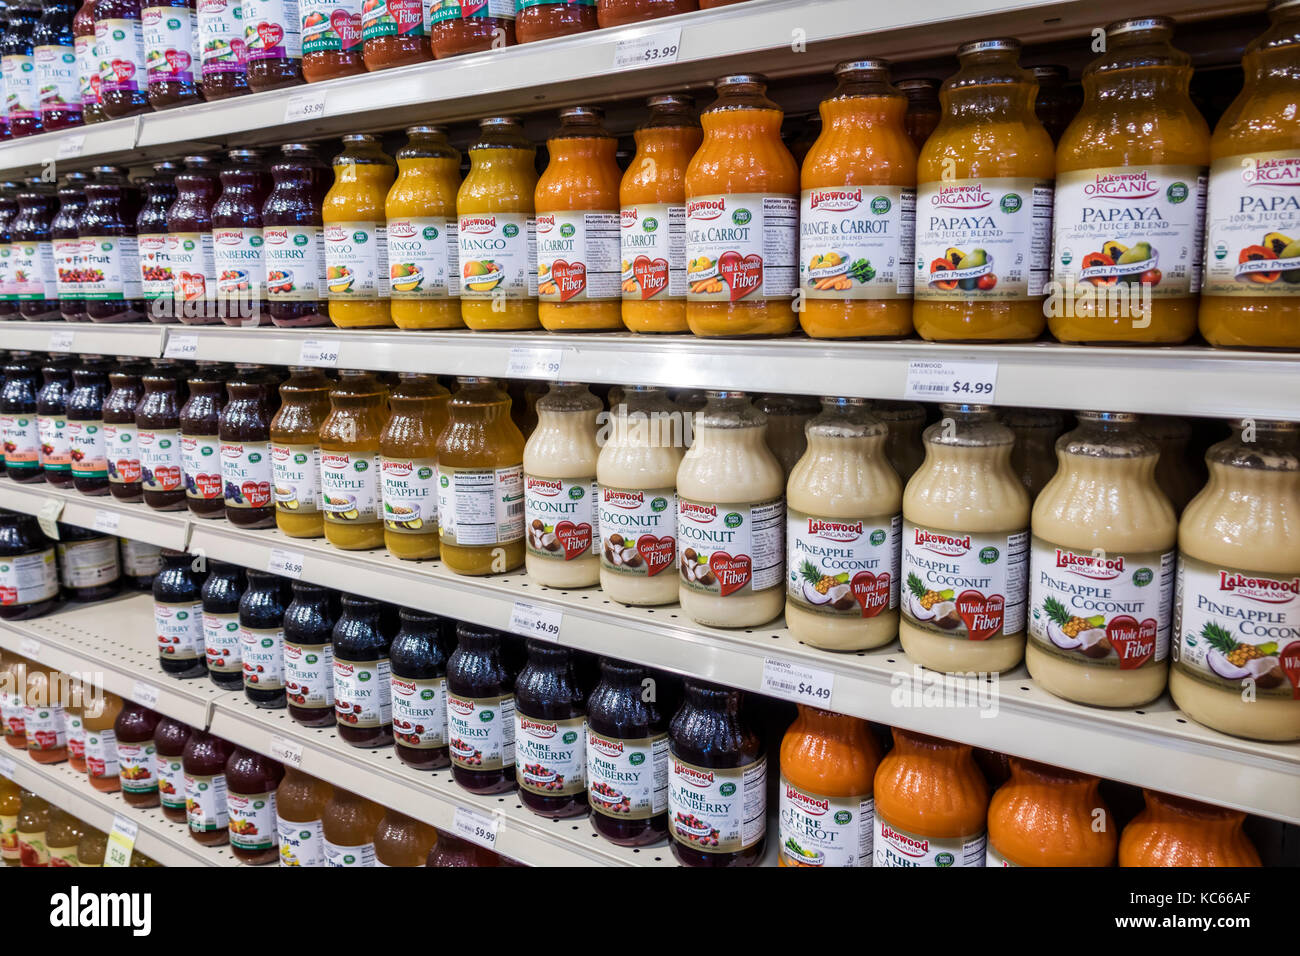 Washington DC District of Columbia MOM's Organic Market grocery store supermarket shopping display shelves fruit - Stock Image